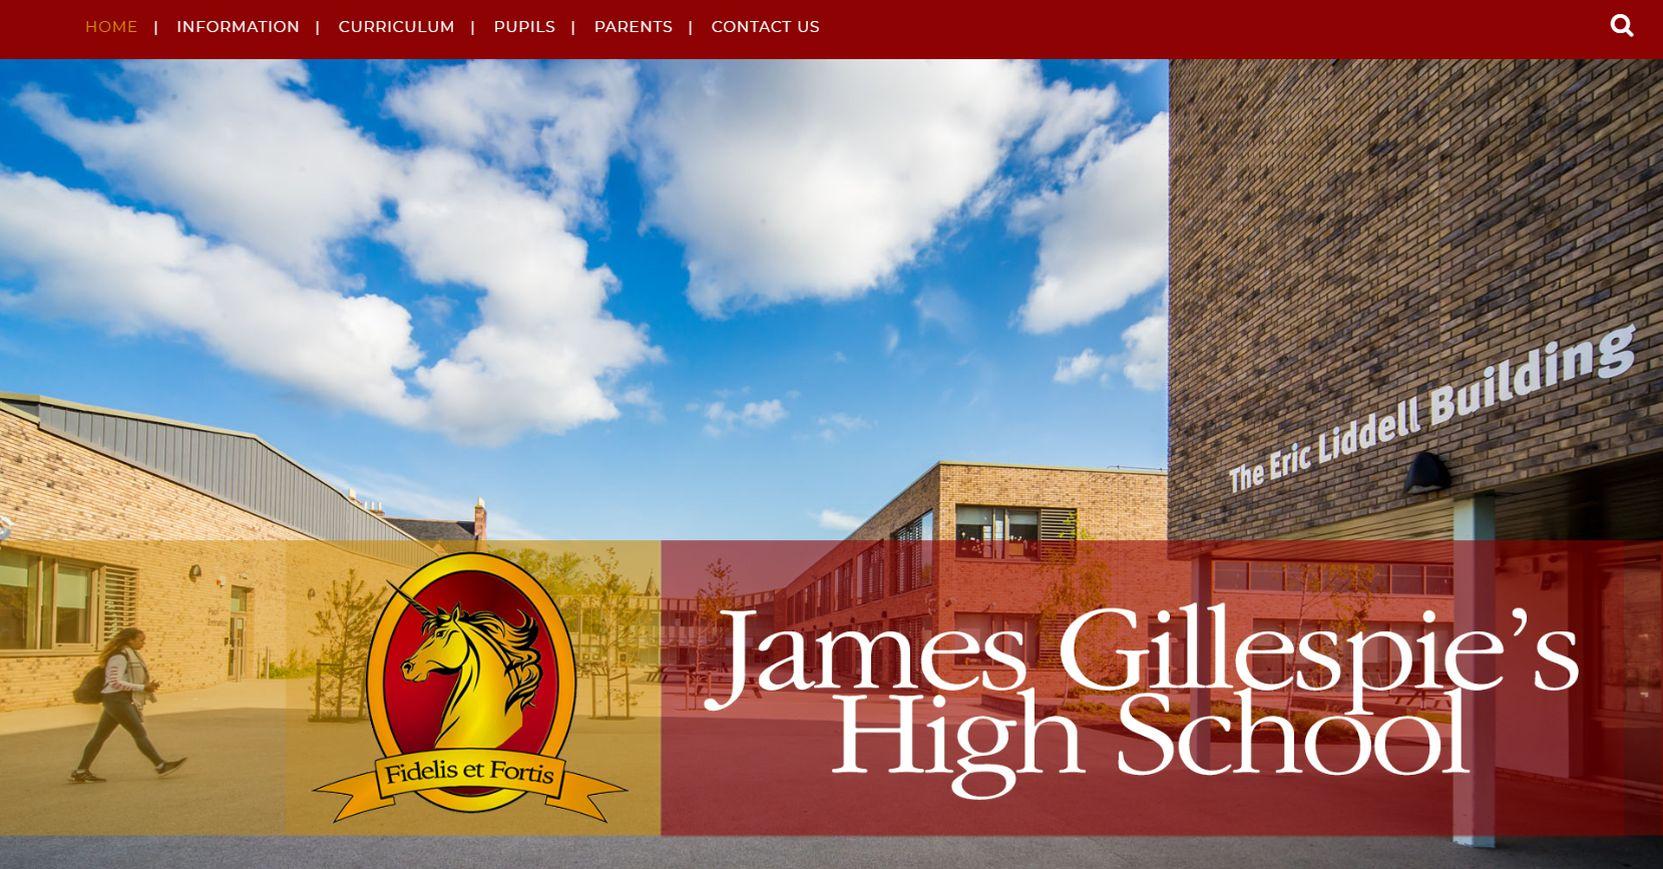 James Gillespie's High School Homepage